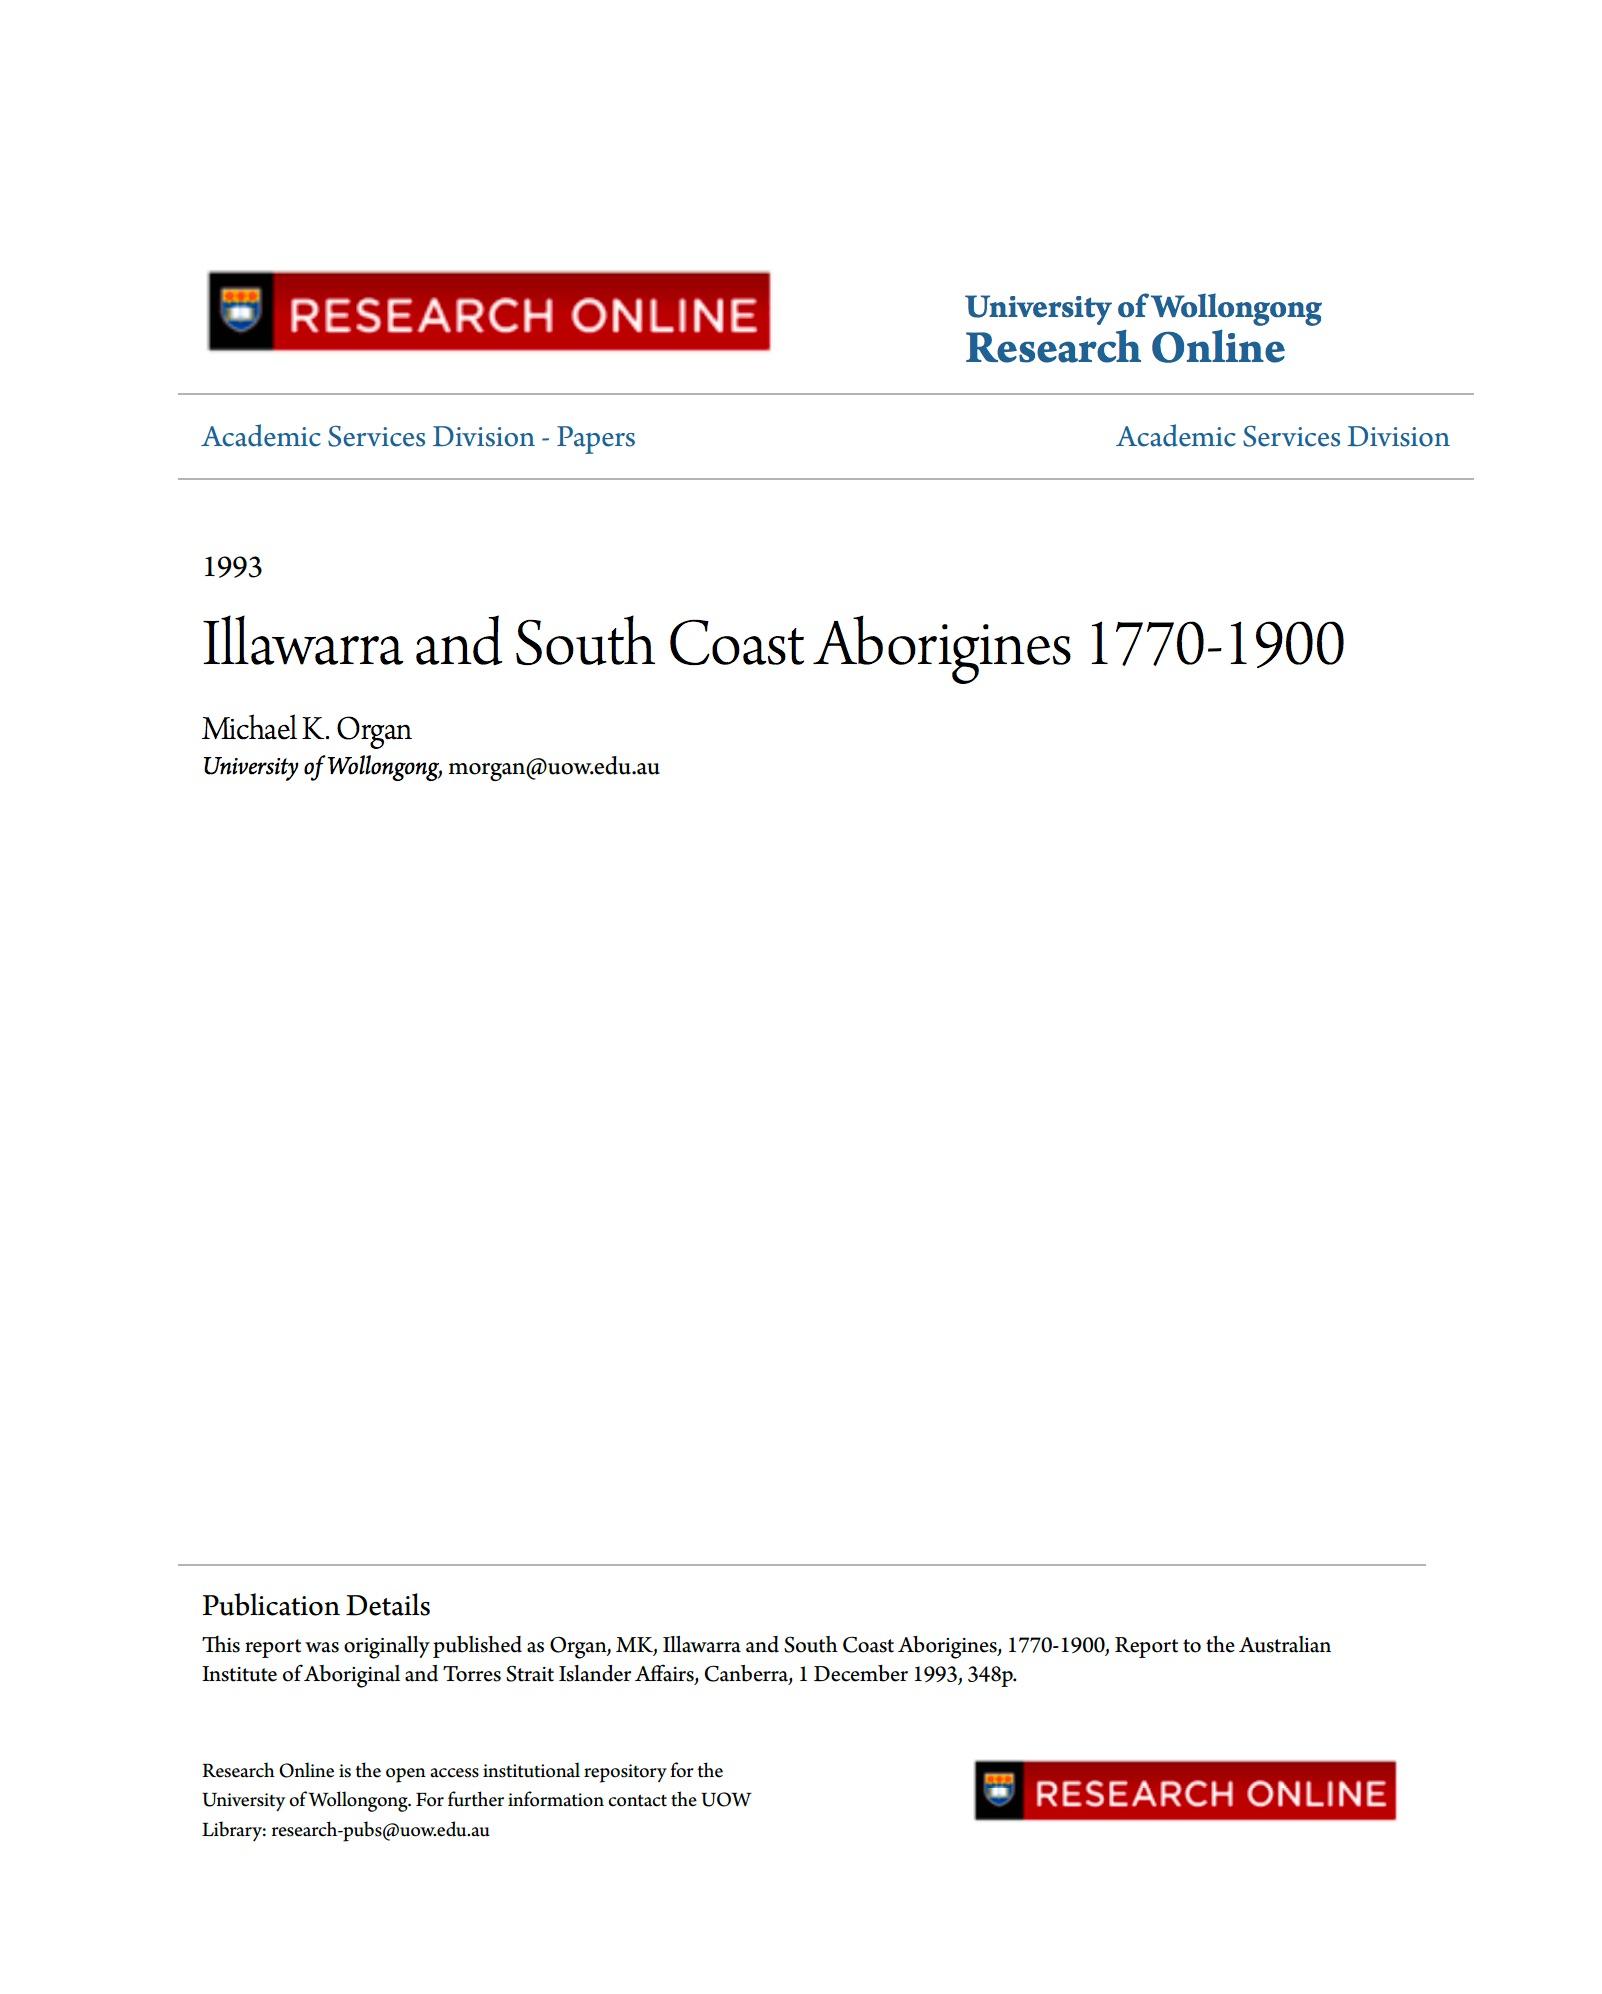 Illawarra and South Coast Aborigines